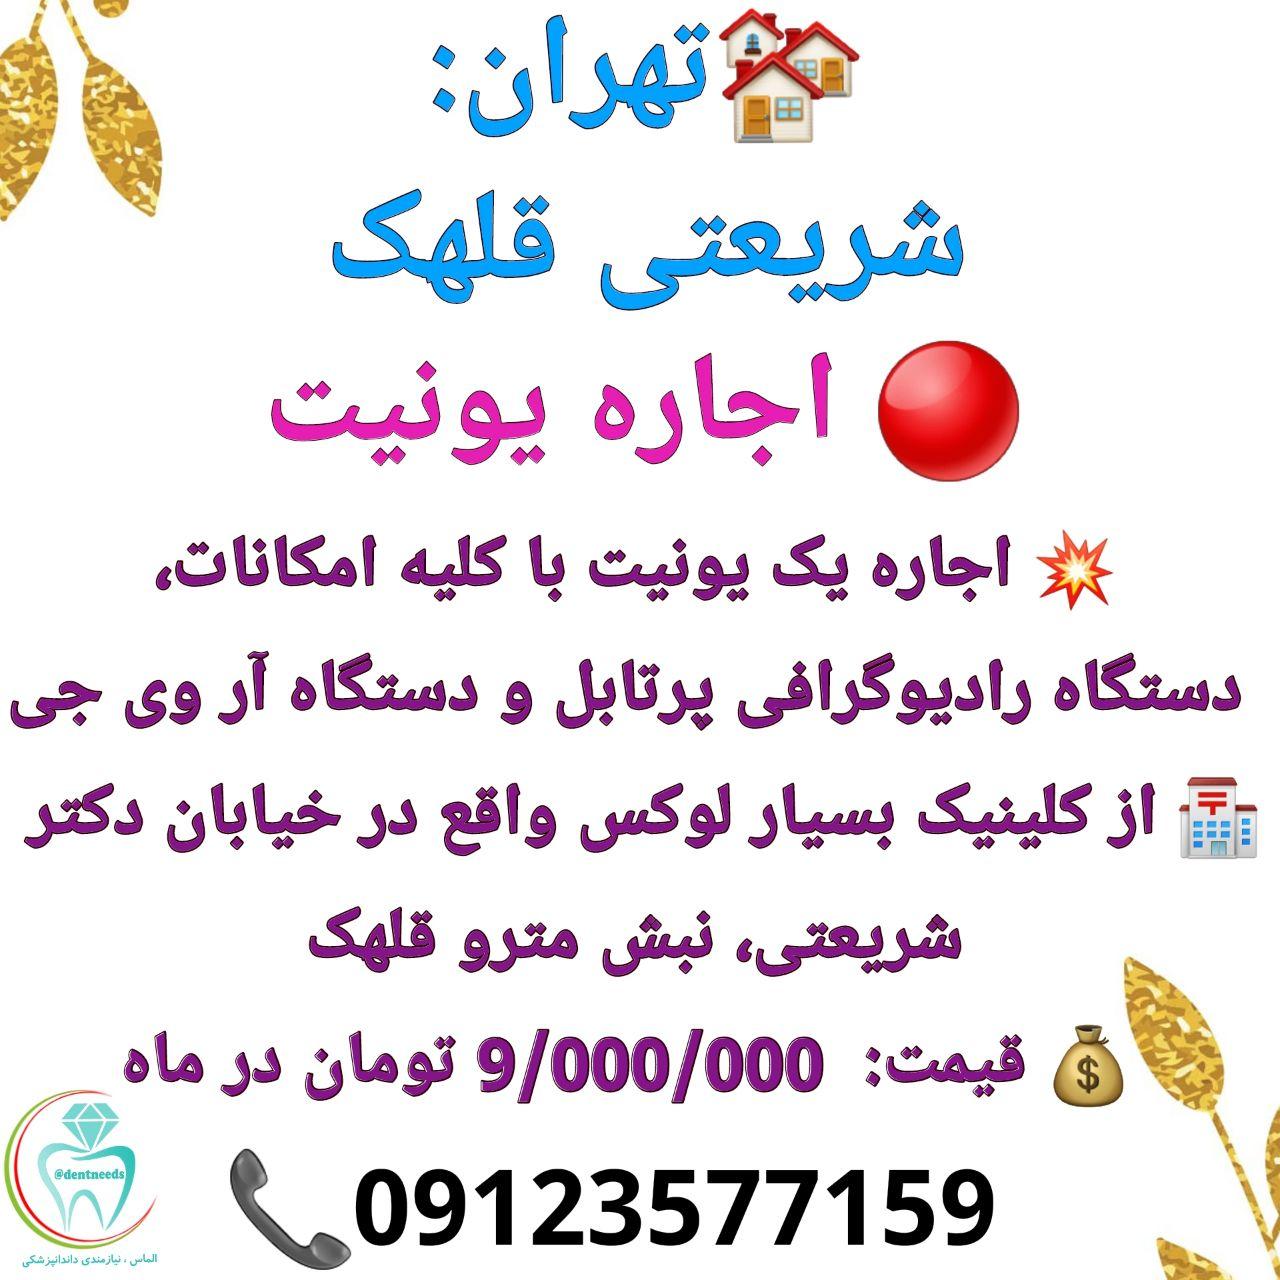 تهران: شریعتی، قلهک، اجاره یونیت